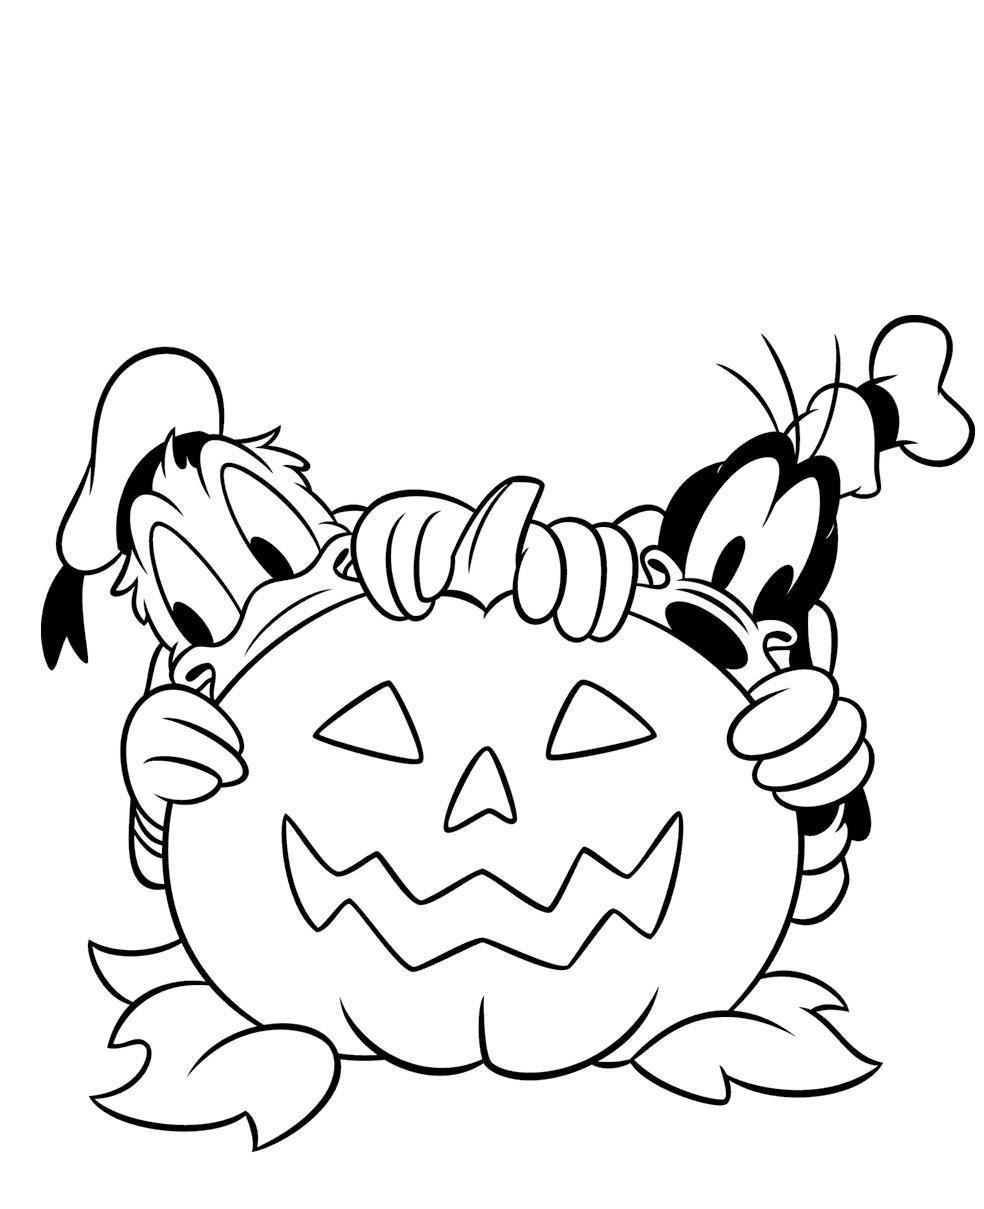 8 Coloriage Halloween Disney A Imprimer Gratuit Cartoon Coloring Pages Halloween Coloring Pages Halloween Coloring